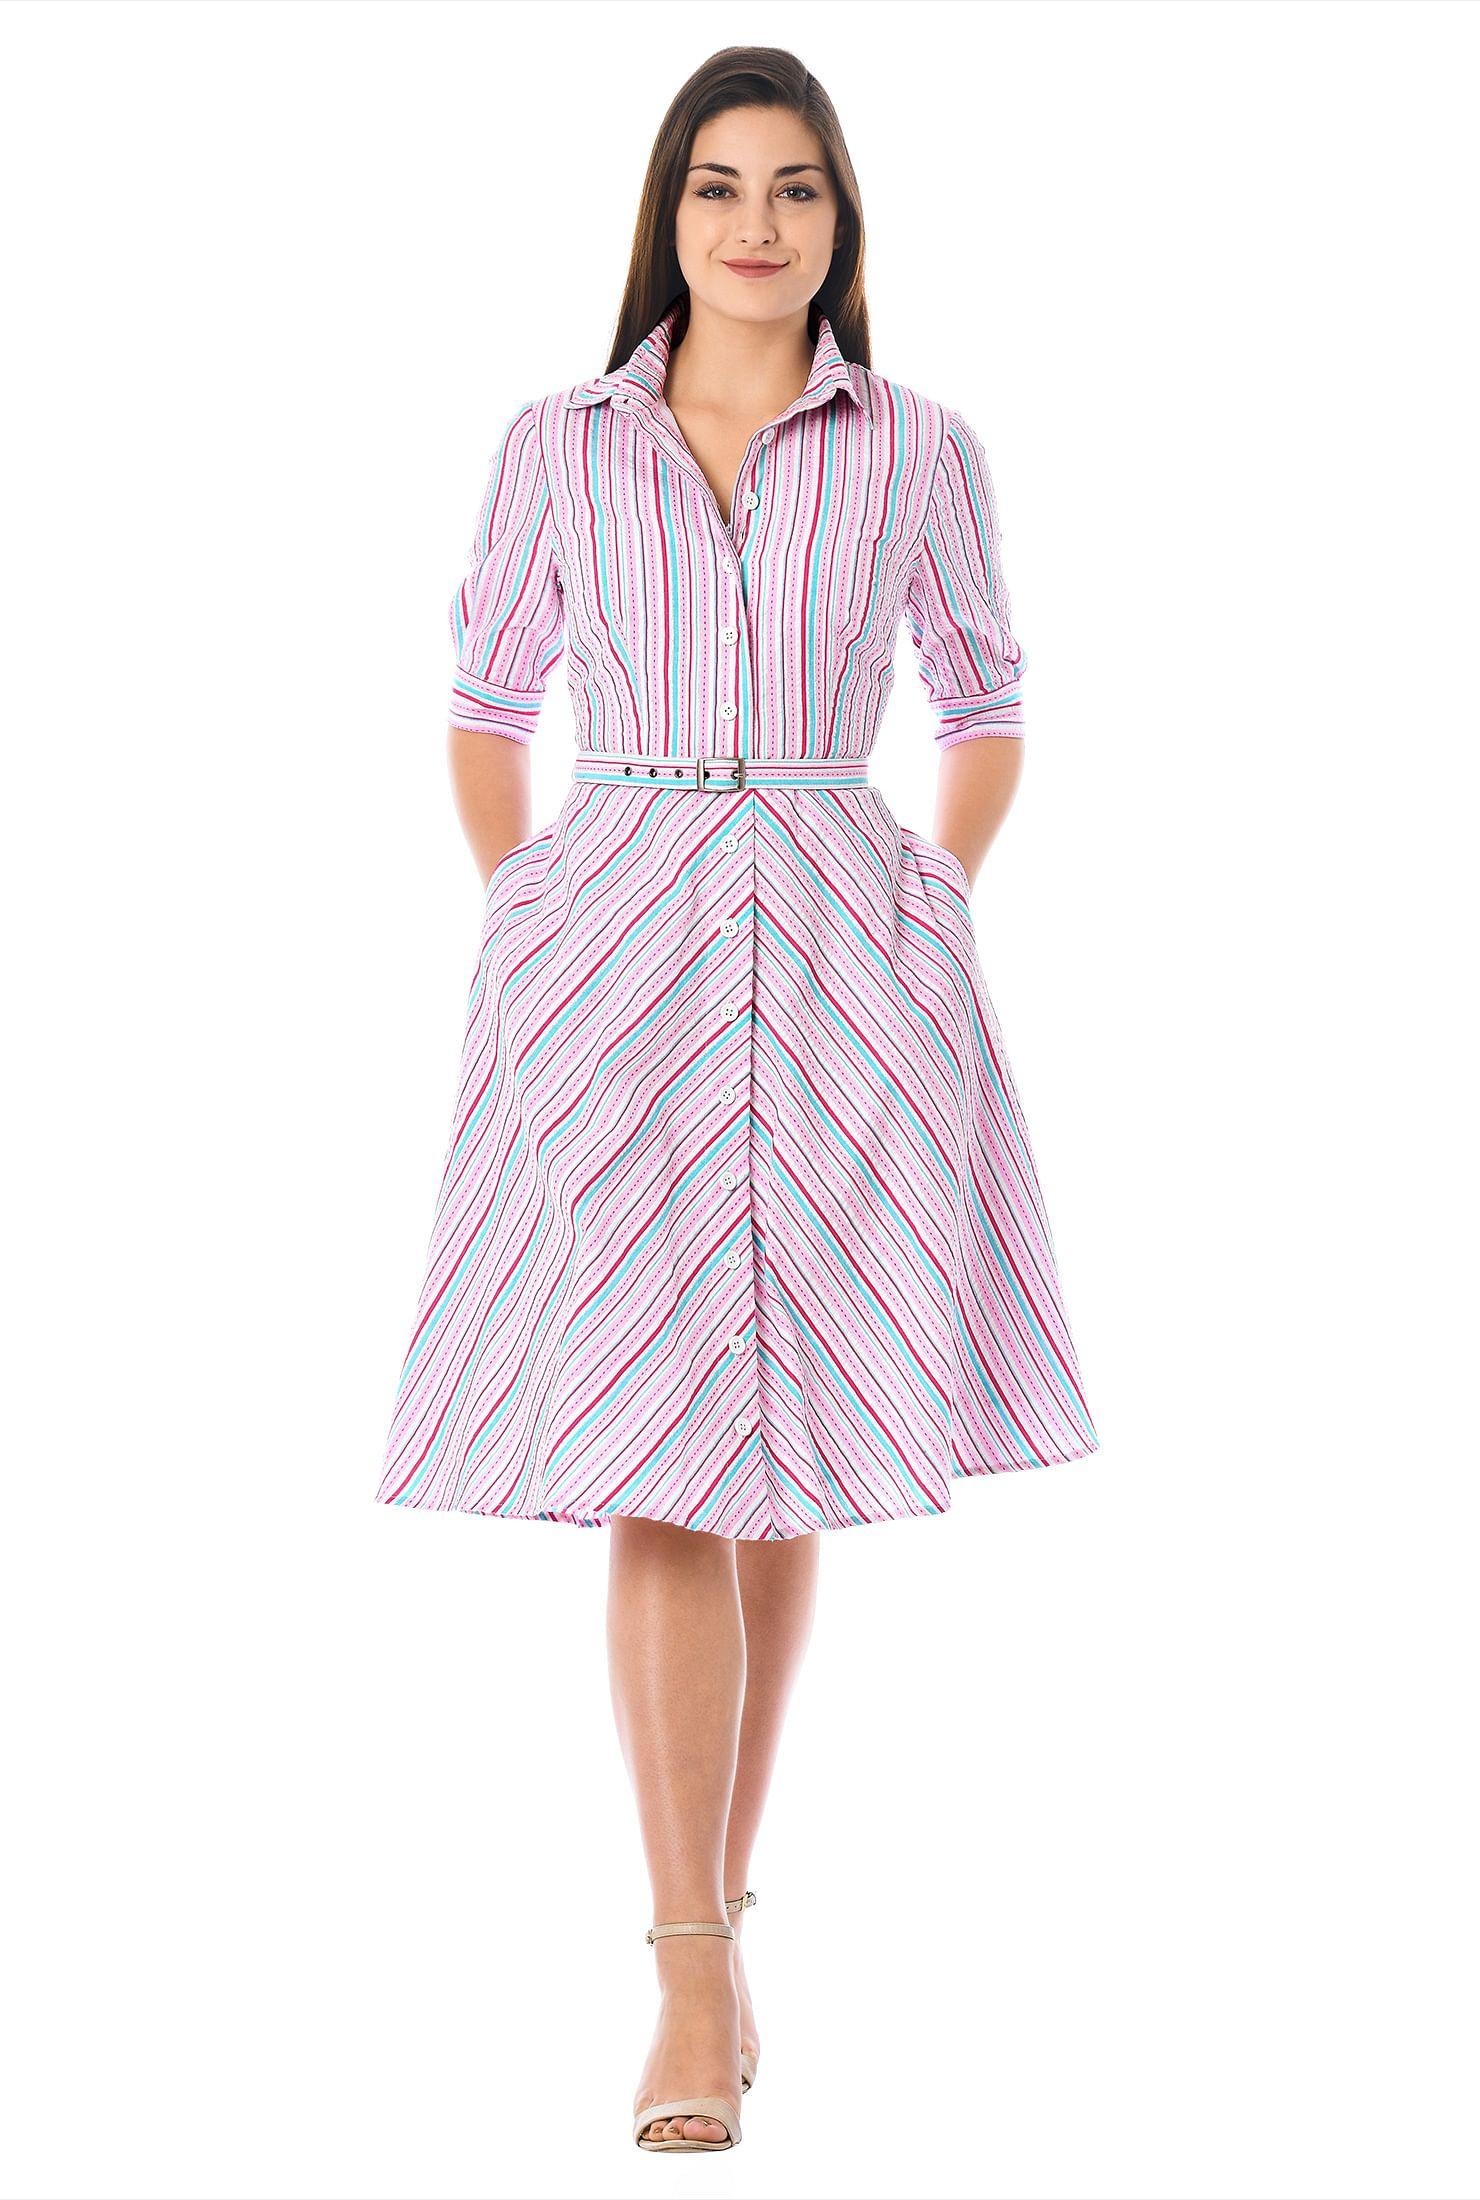 ebaeb364e004 below knee length dresses, button front dresses, casual event dresses,  Collared Dresses